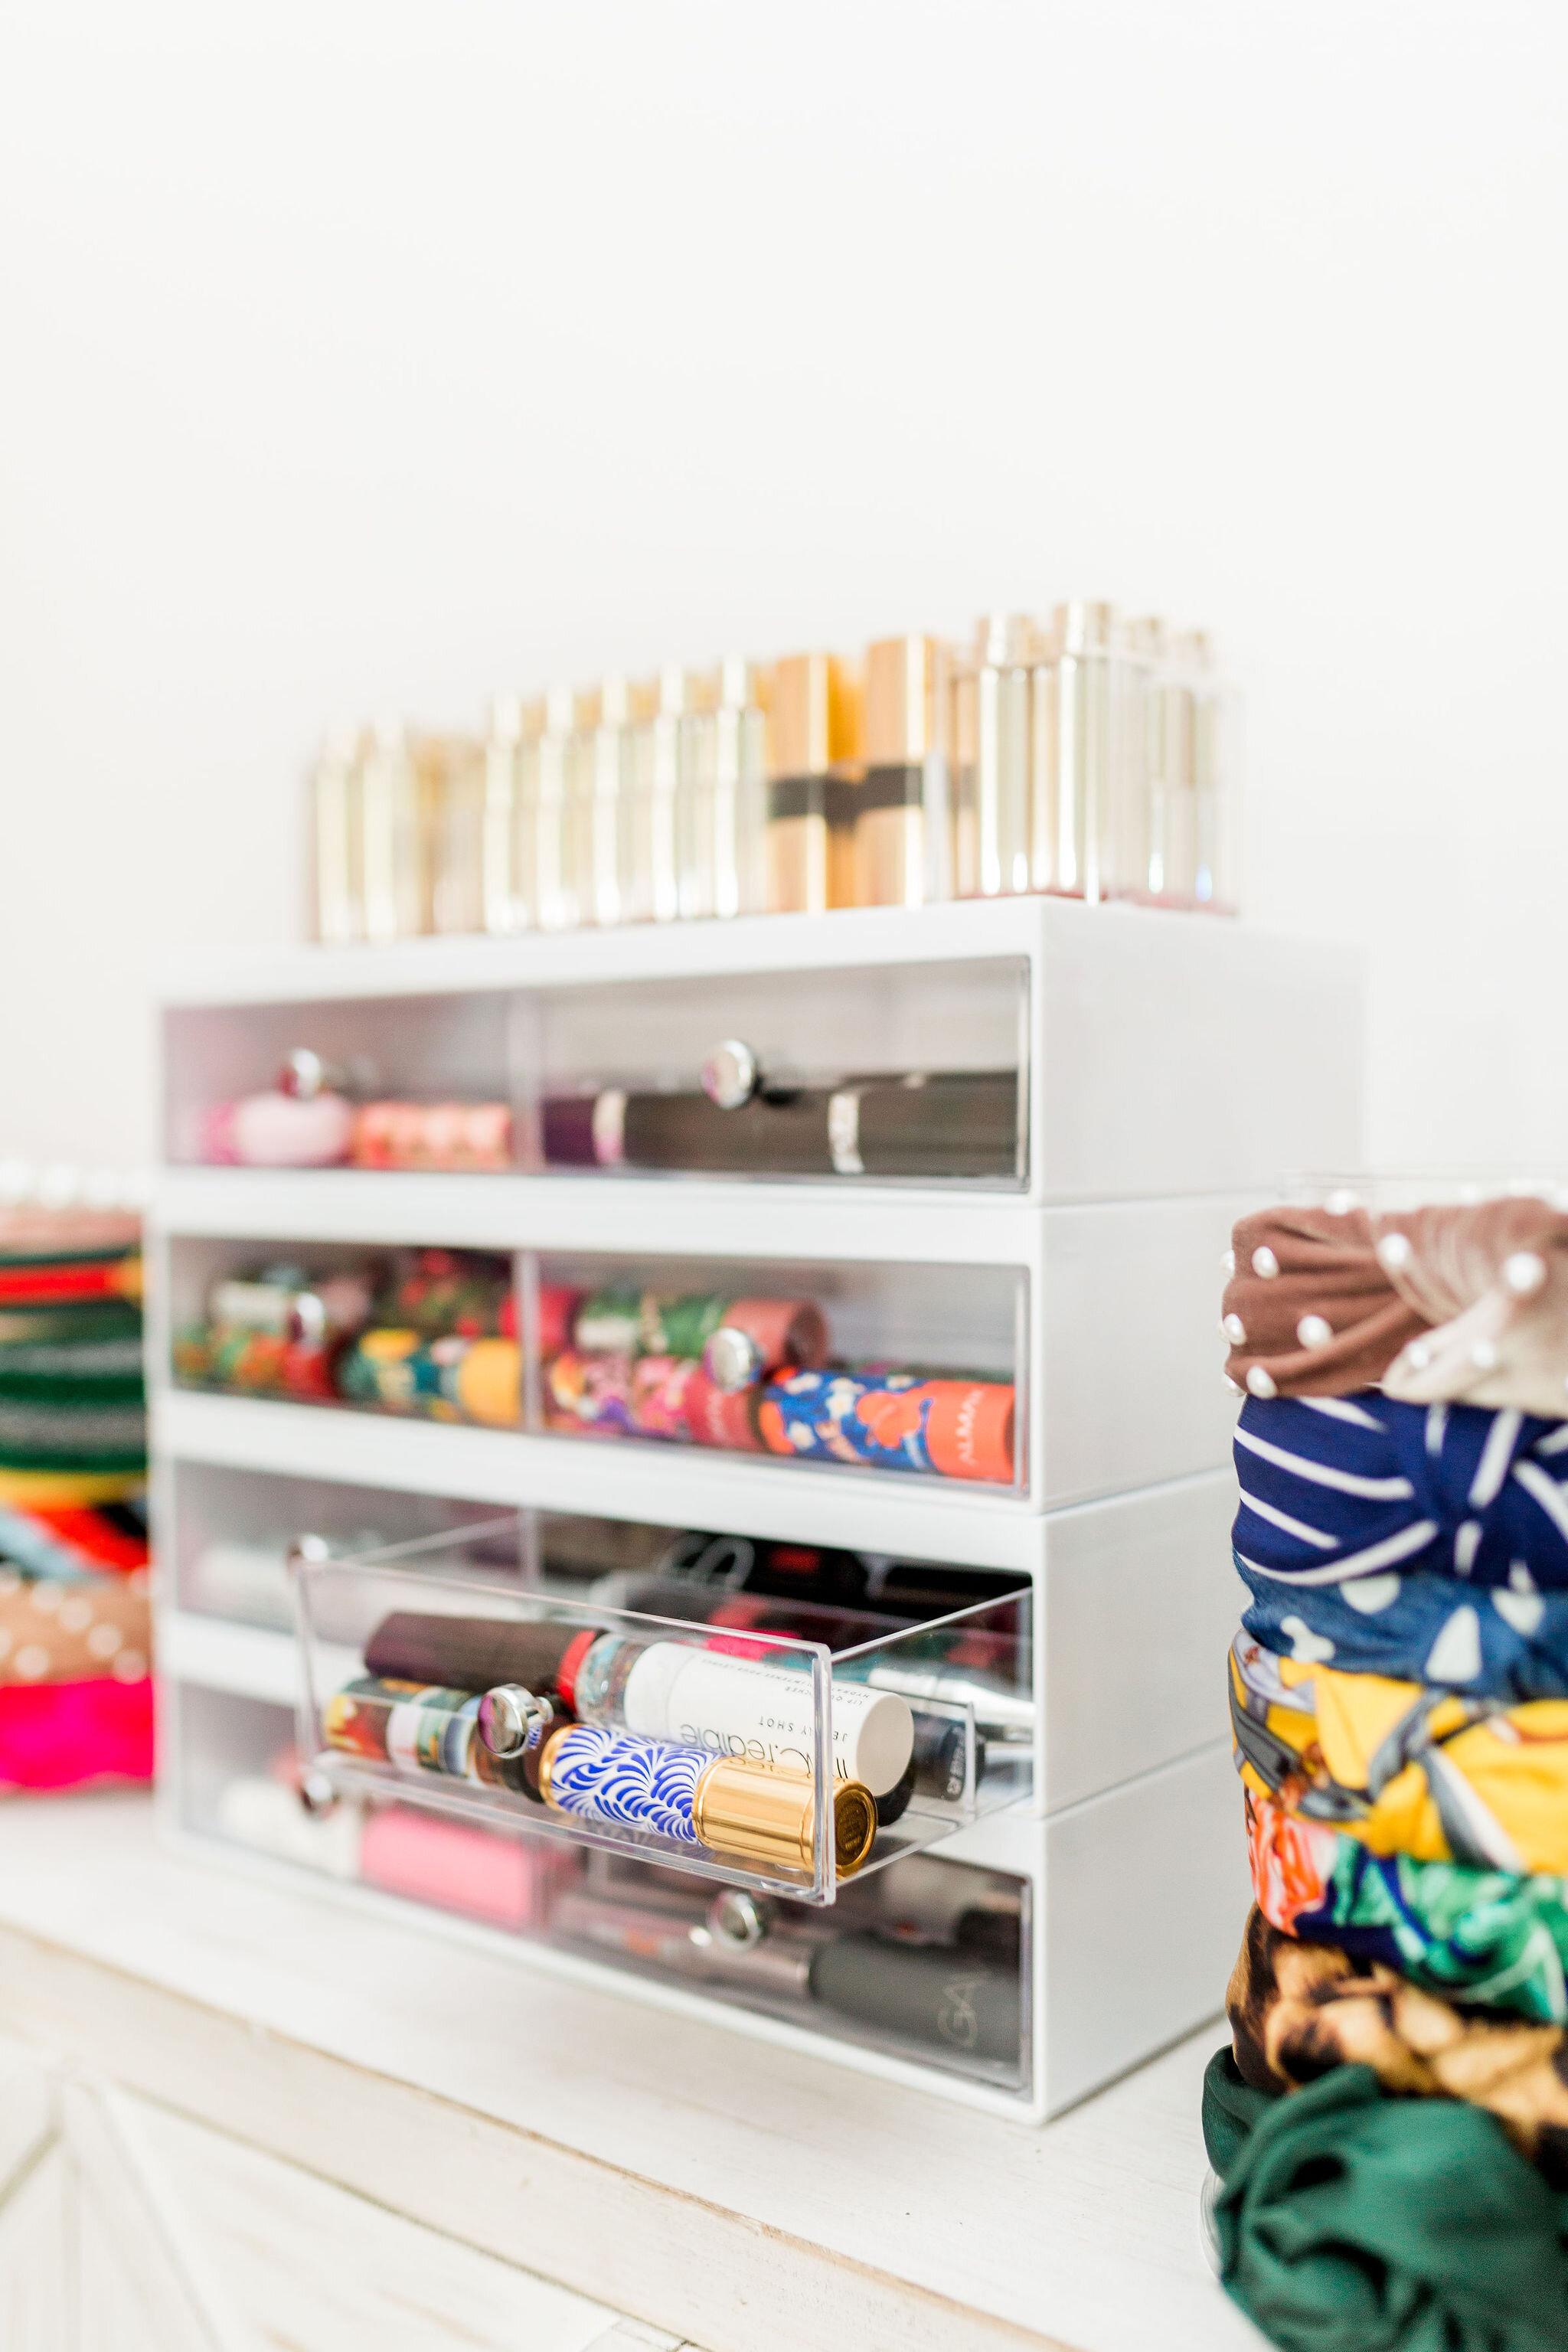 Lipstick Organizer - Makeup needs a beautiful home & storage solution